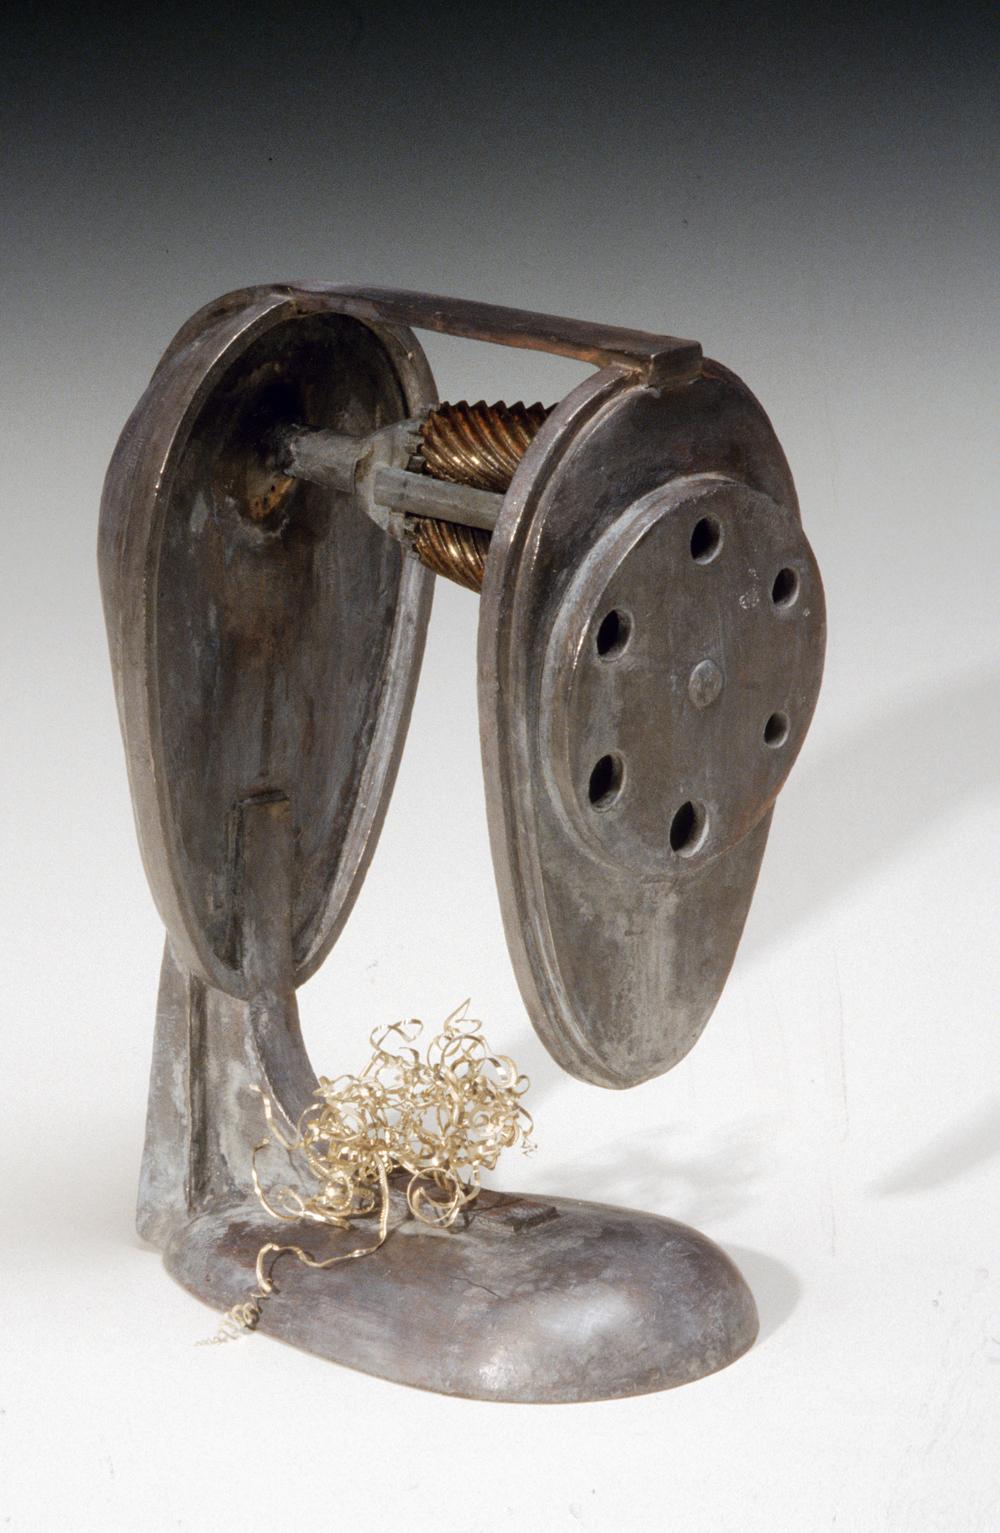 Metalgrammatic pencil sharpener sculpture about art criticism